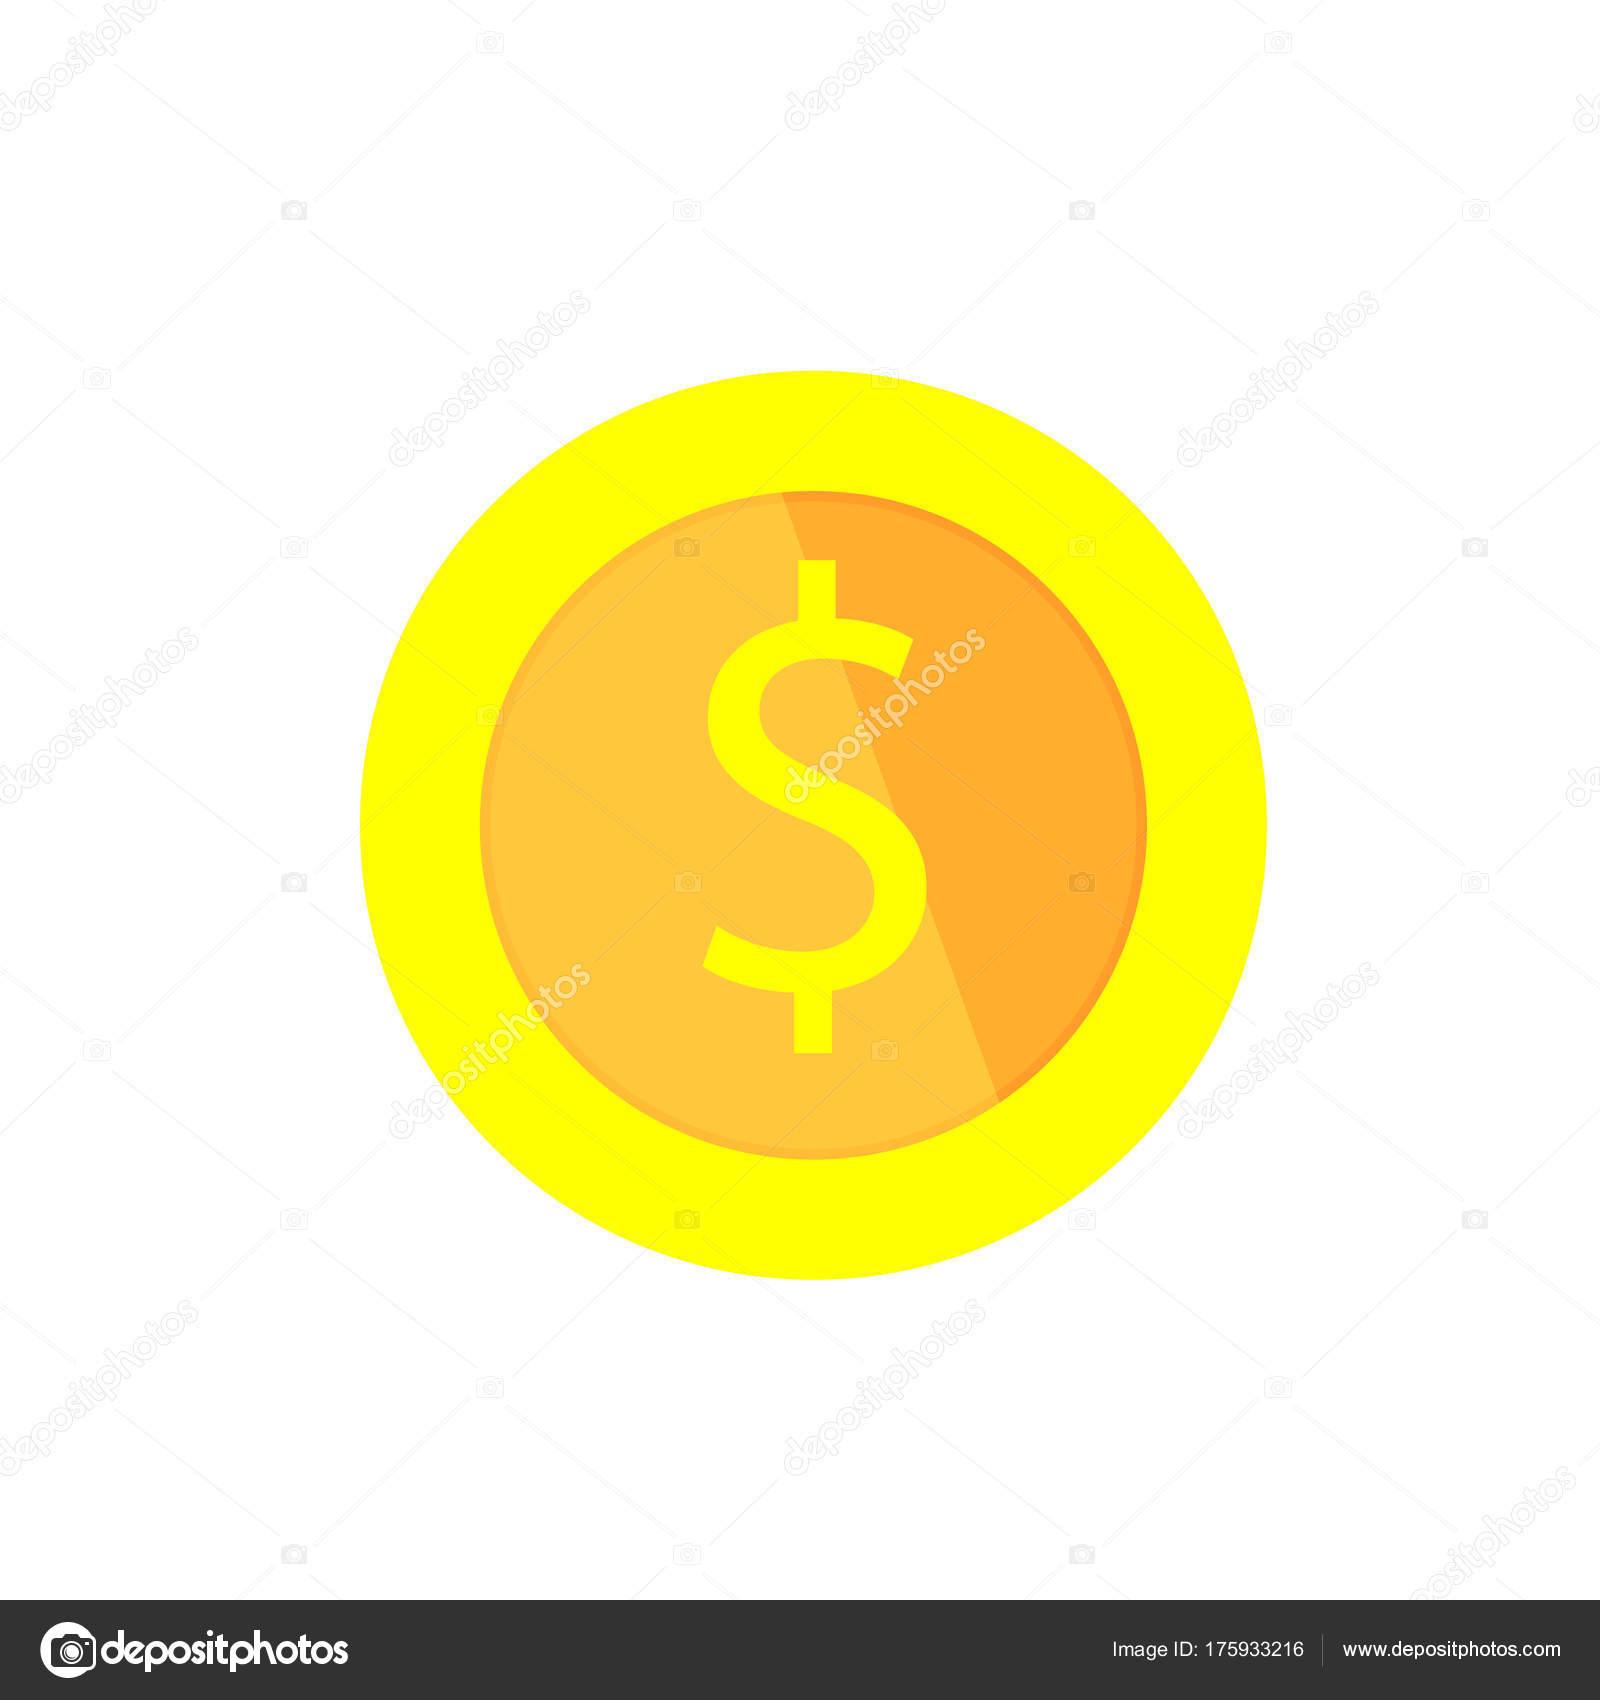 Vector gold coin  Flat illustration  Dollar sign  Cartoon